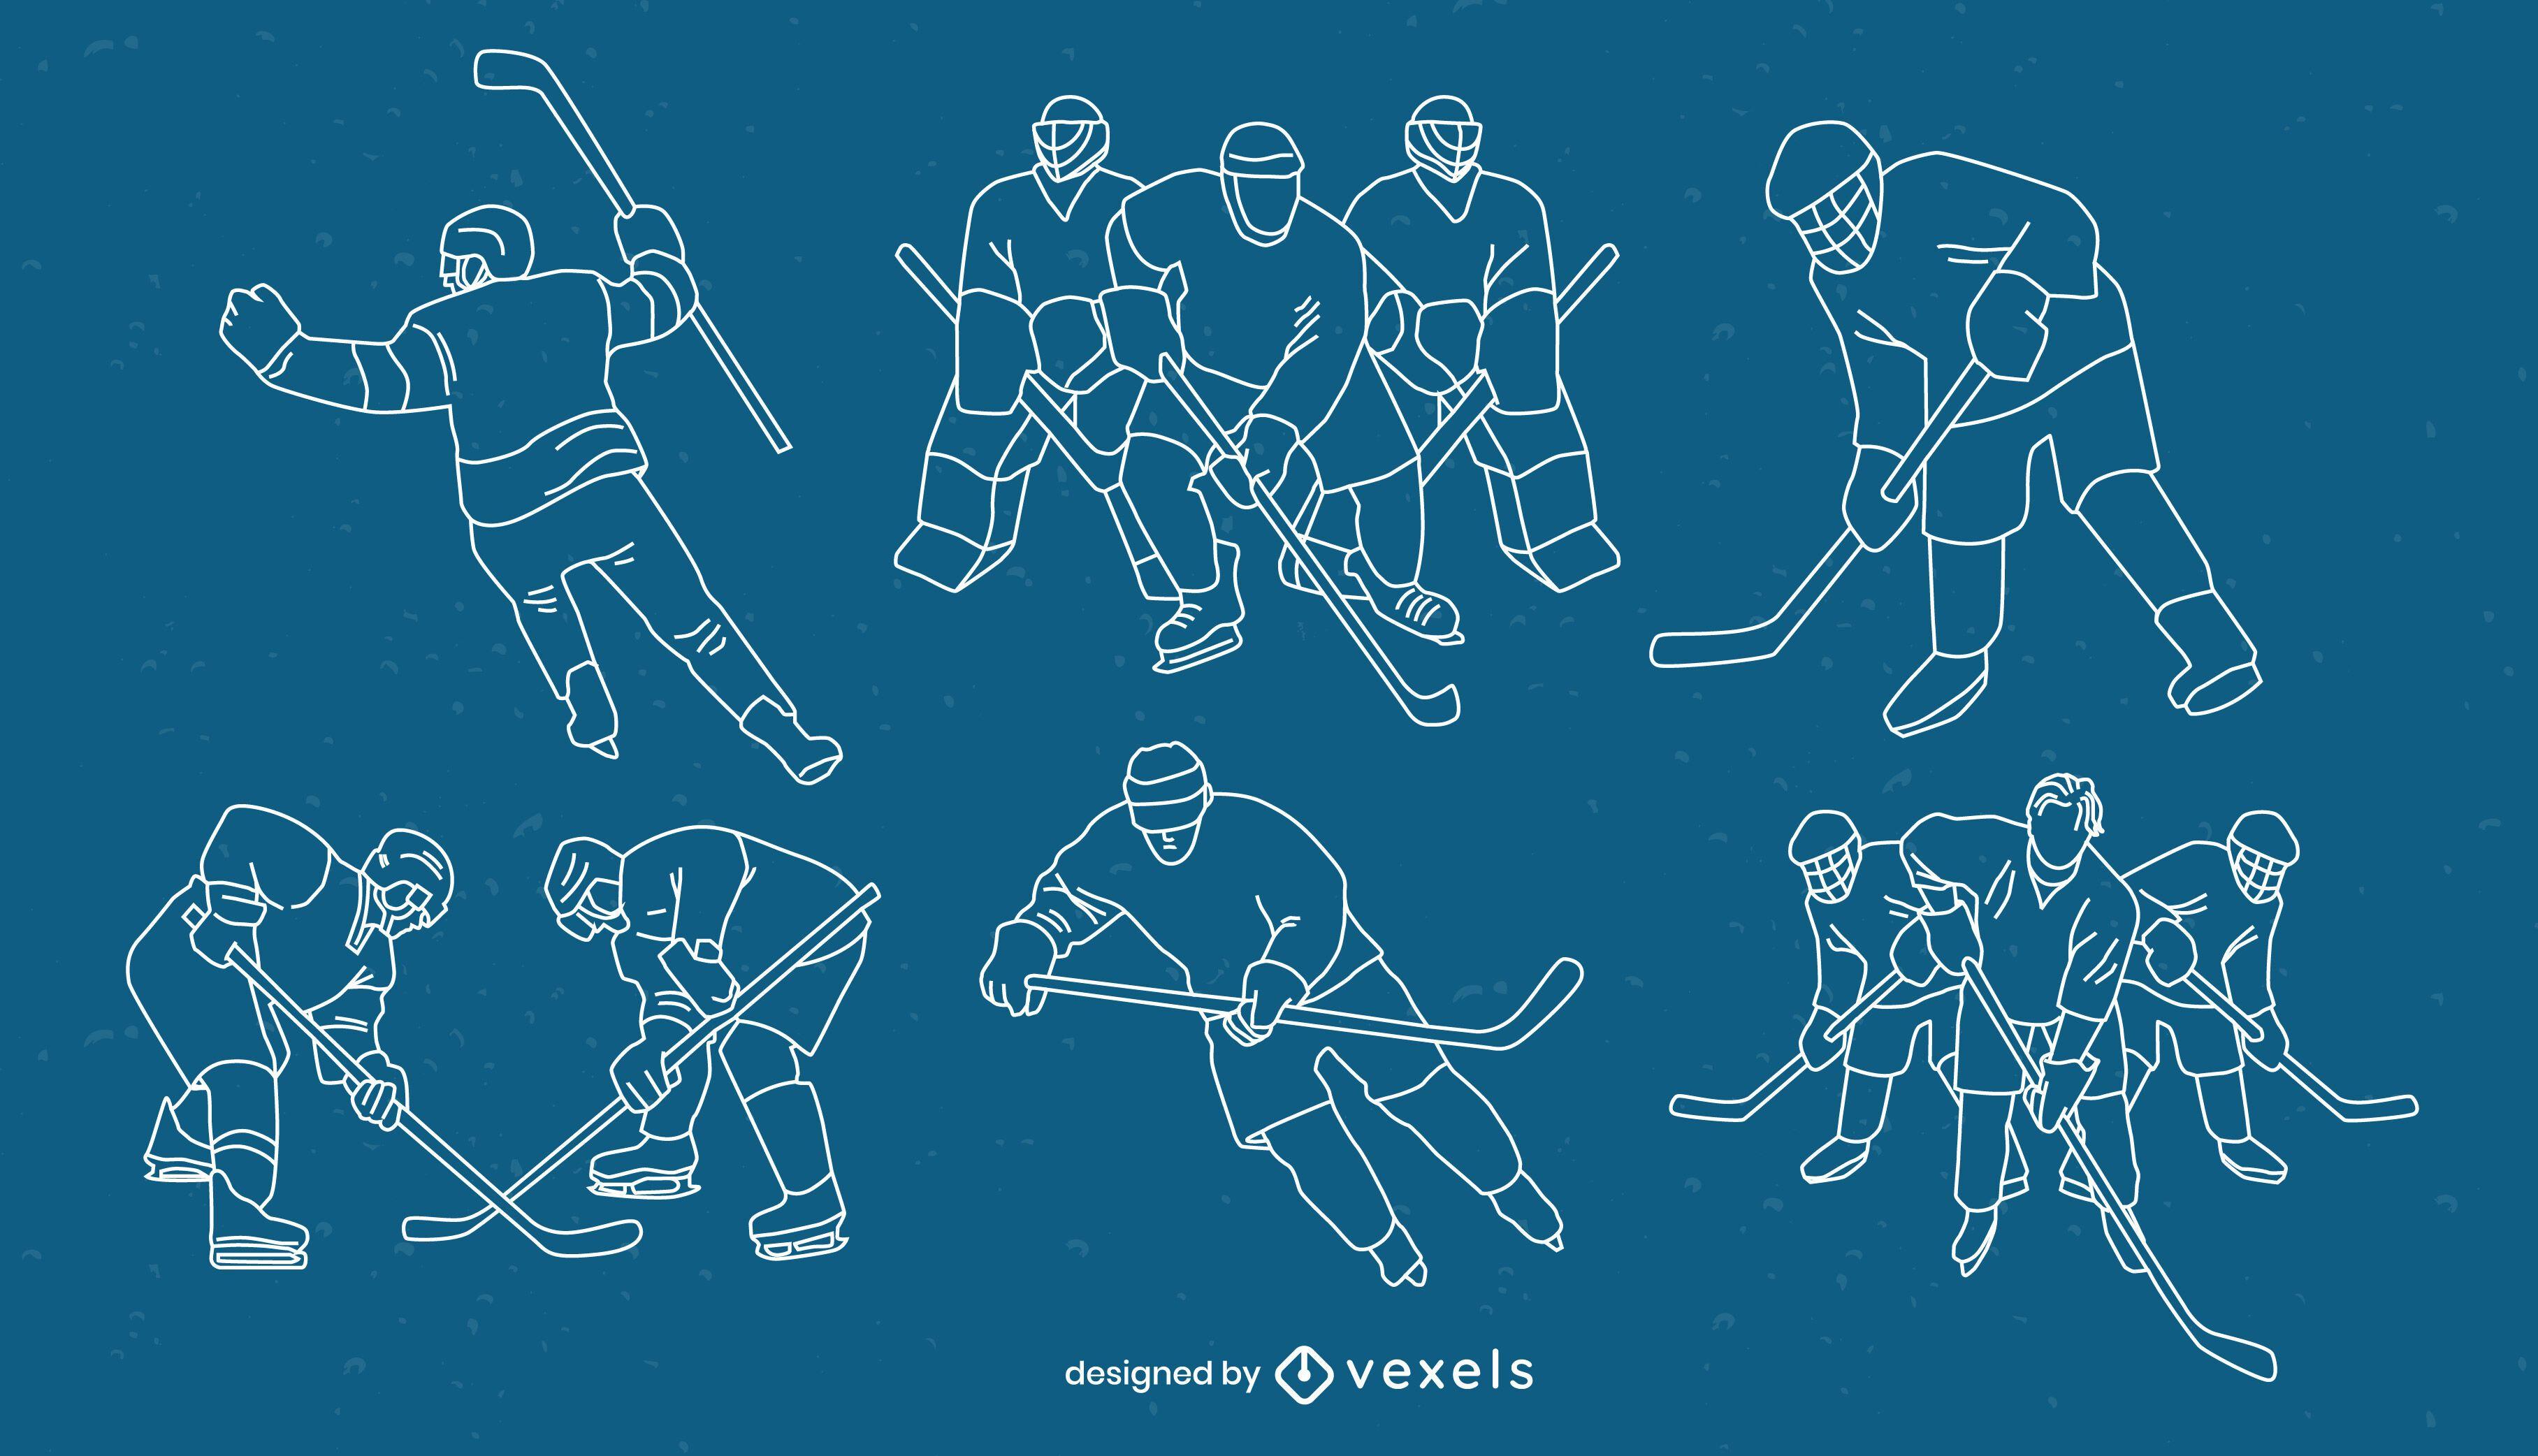 Jogadores de hóquei no gelo posam conjunto de tacadas esportivas